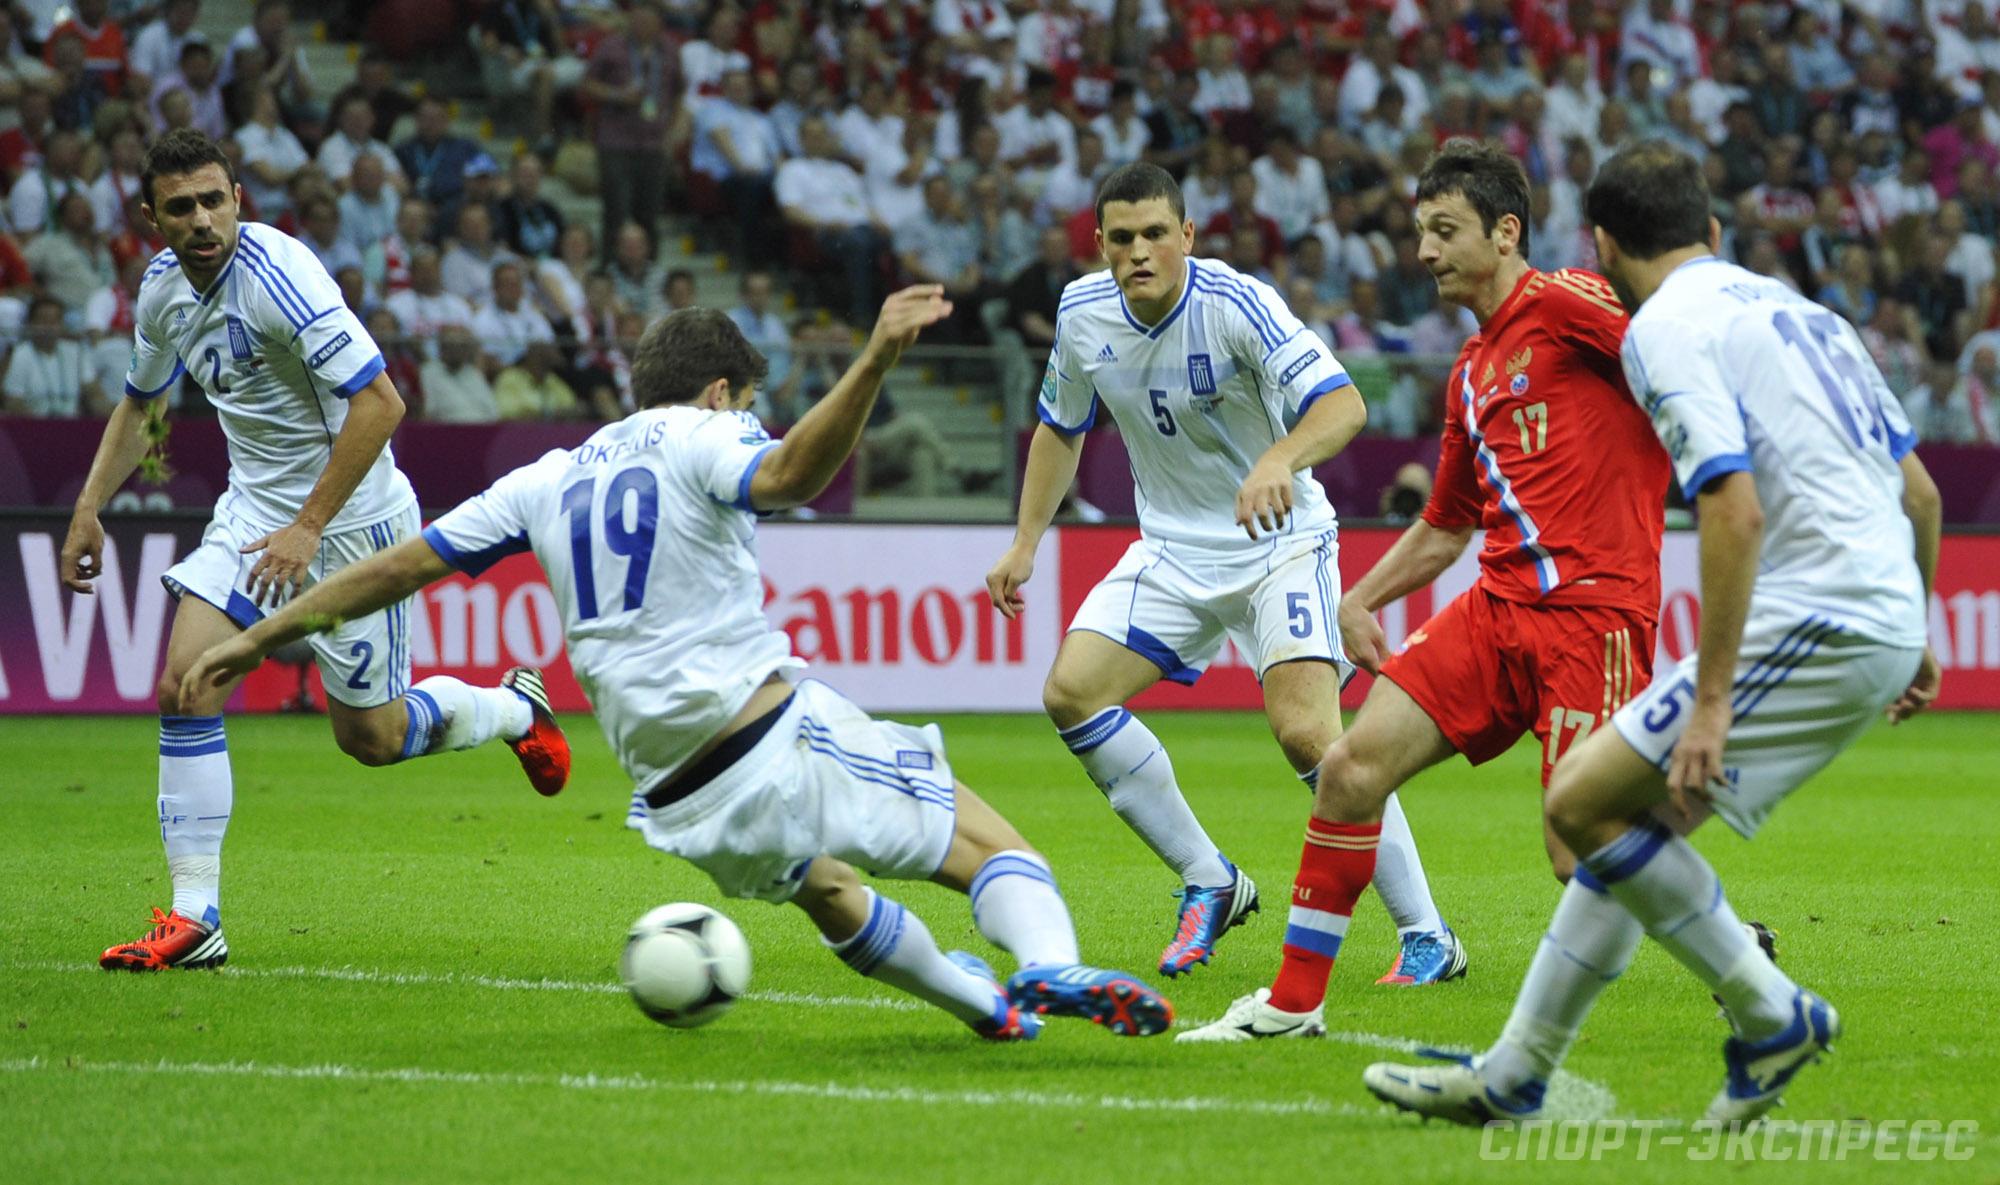 Нидерланды — Греция. Прогноз на товарищеский матч 01.09.2016